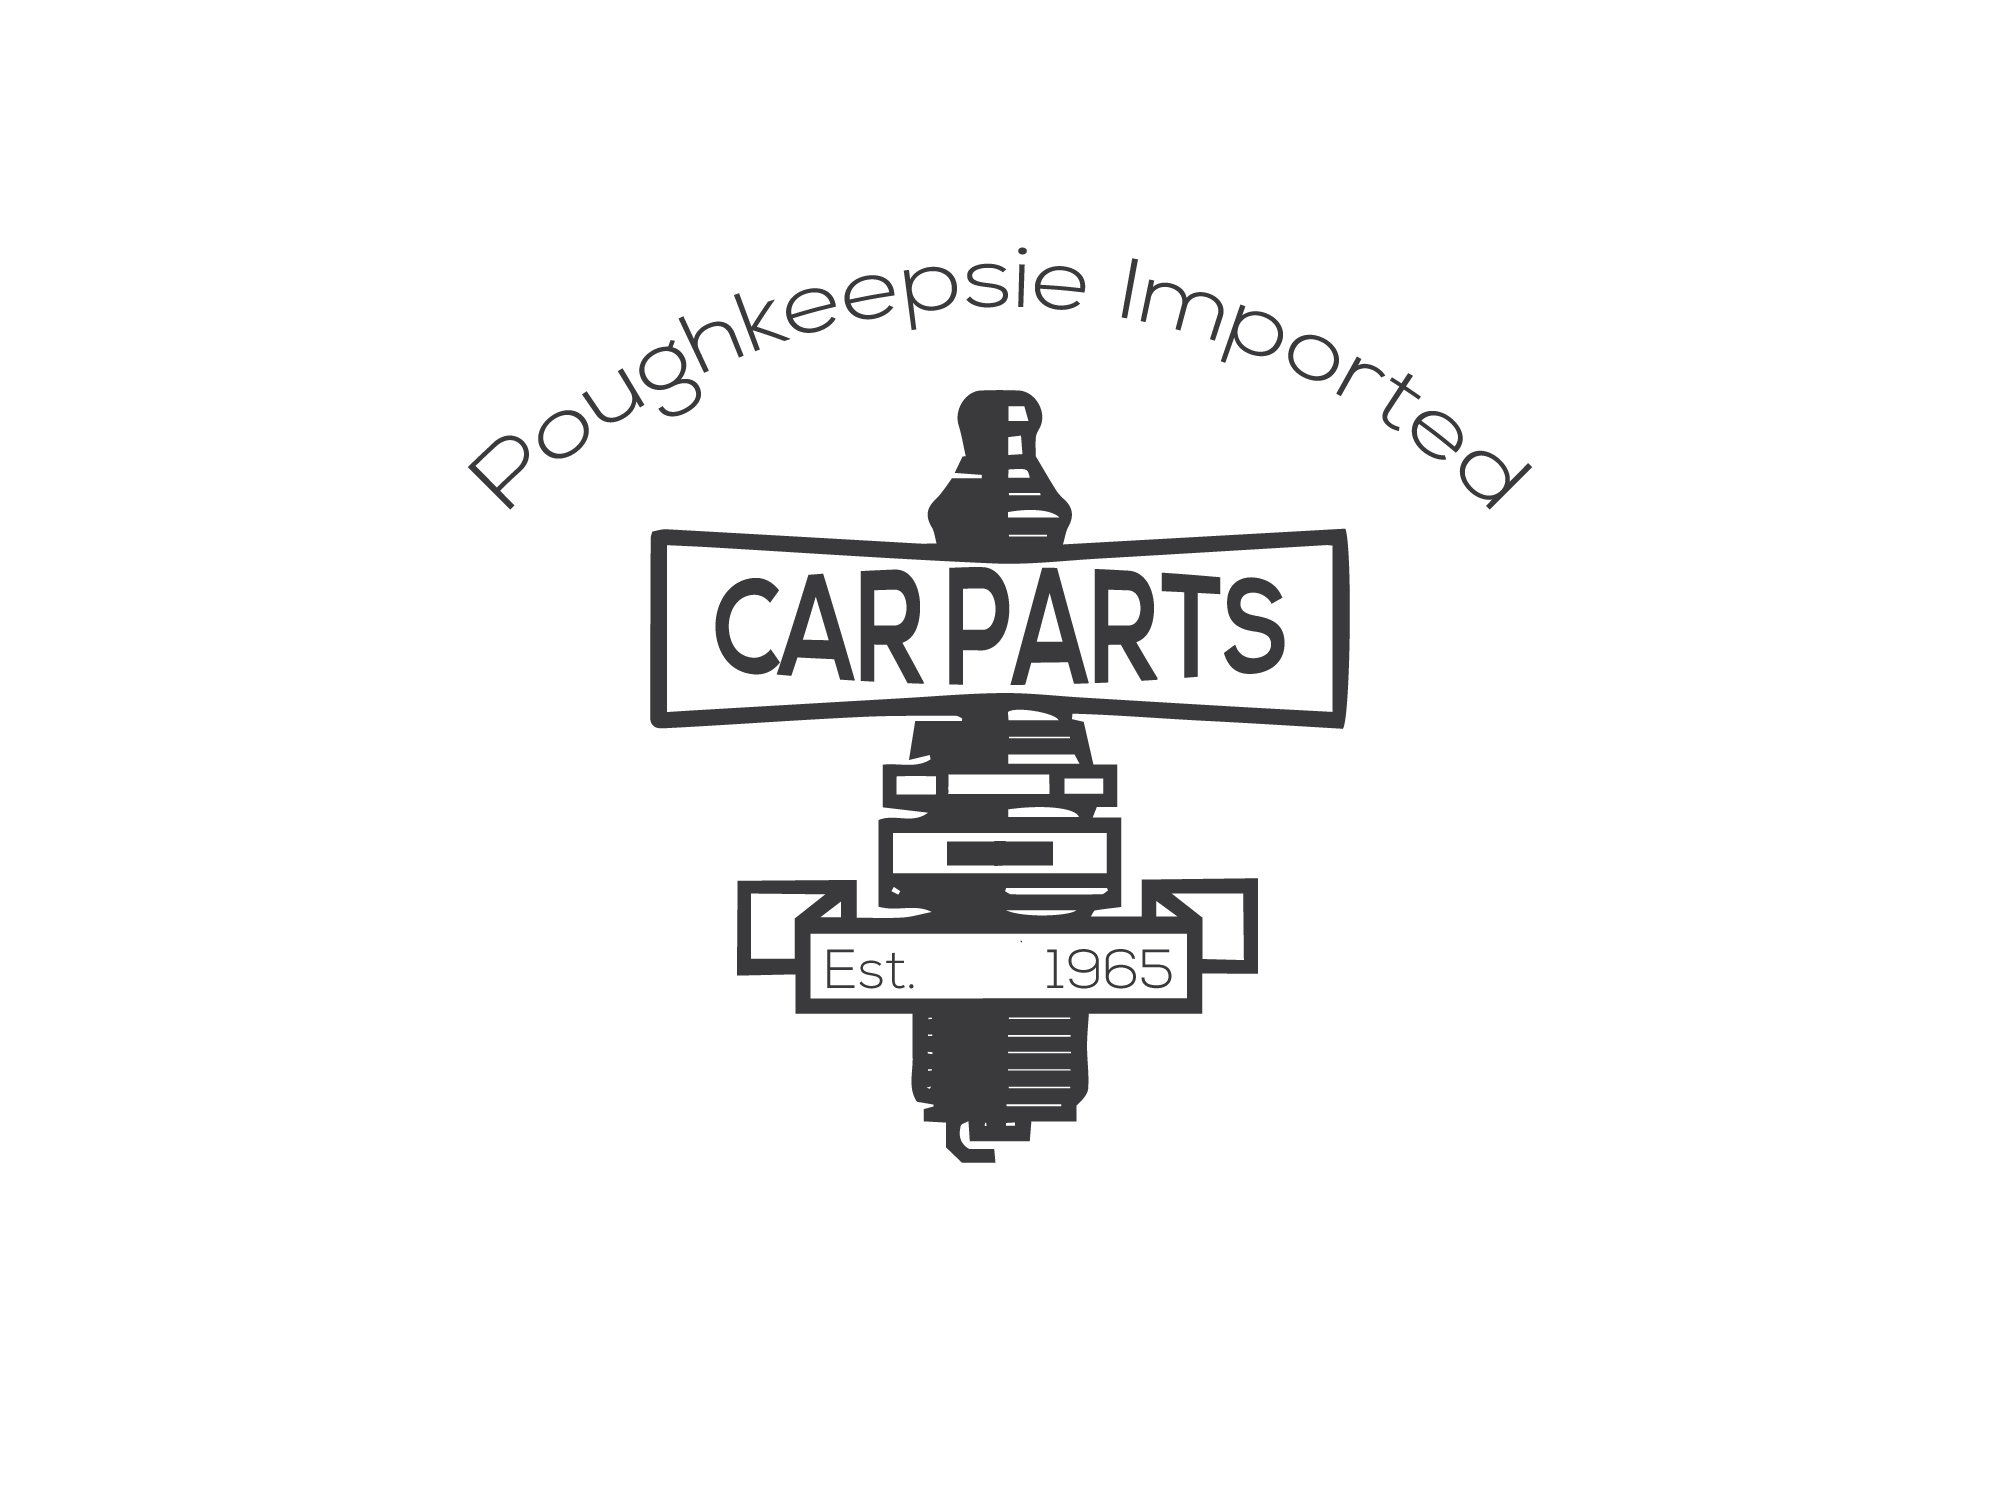 Poughkeepsie Imported Car Parts Logo